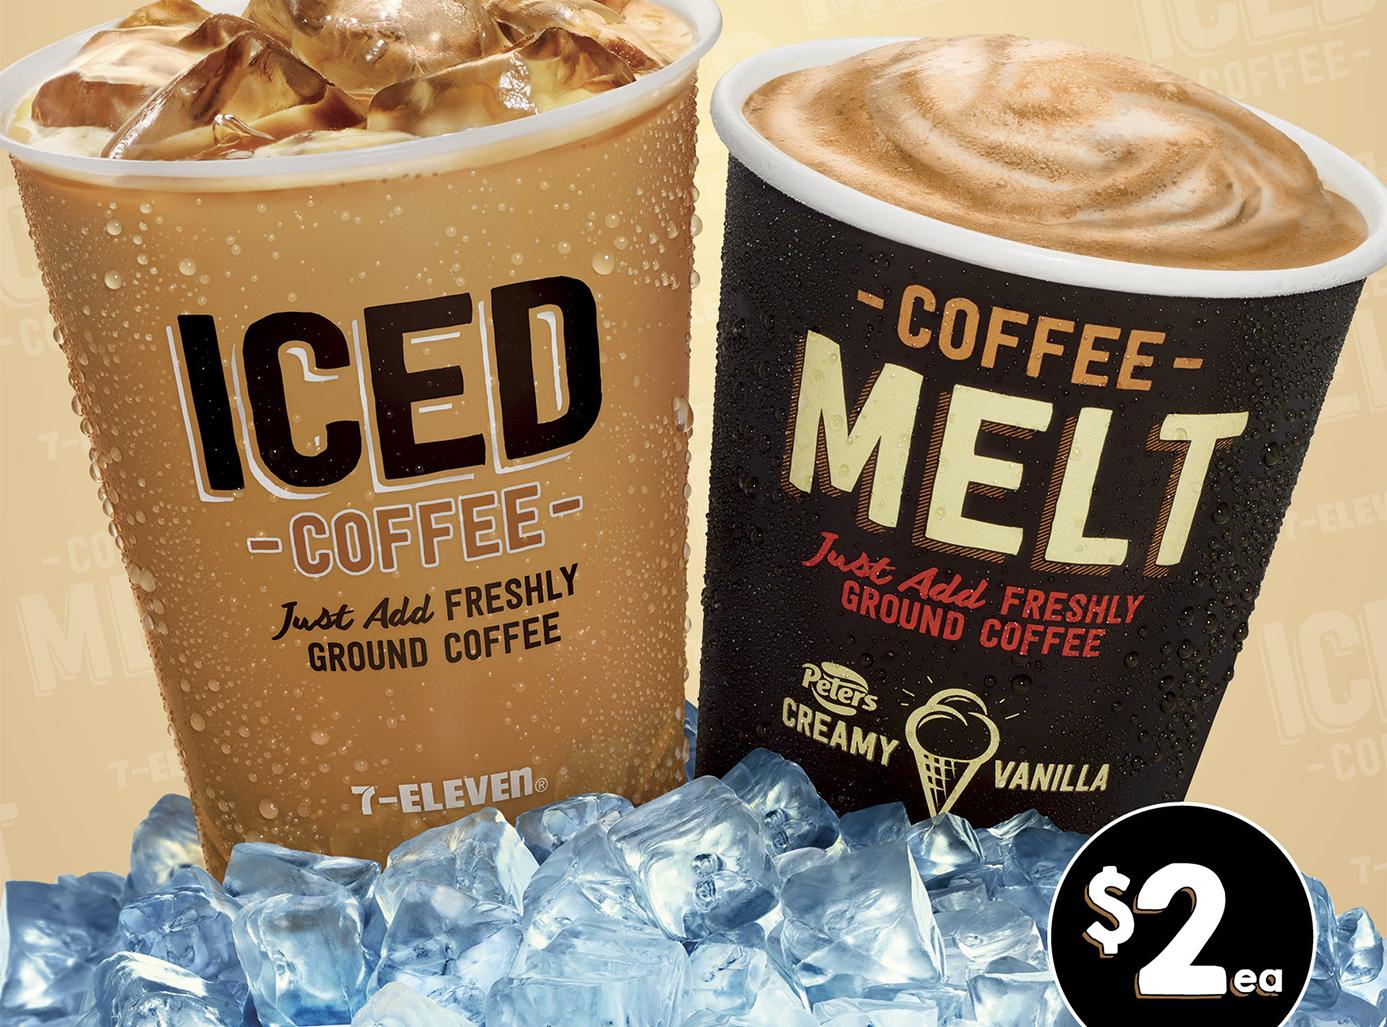 7ES2809_Iced_Coffee_Jan_Freezer_Decal_21